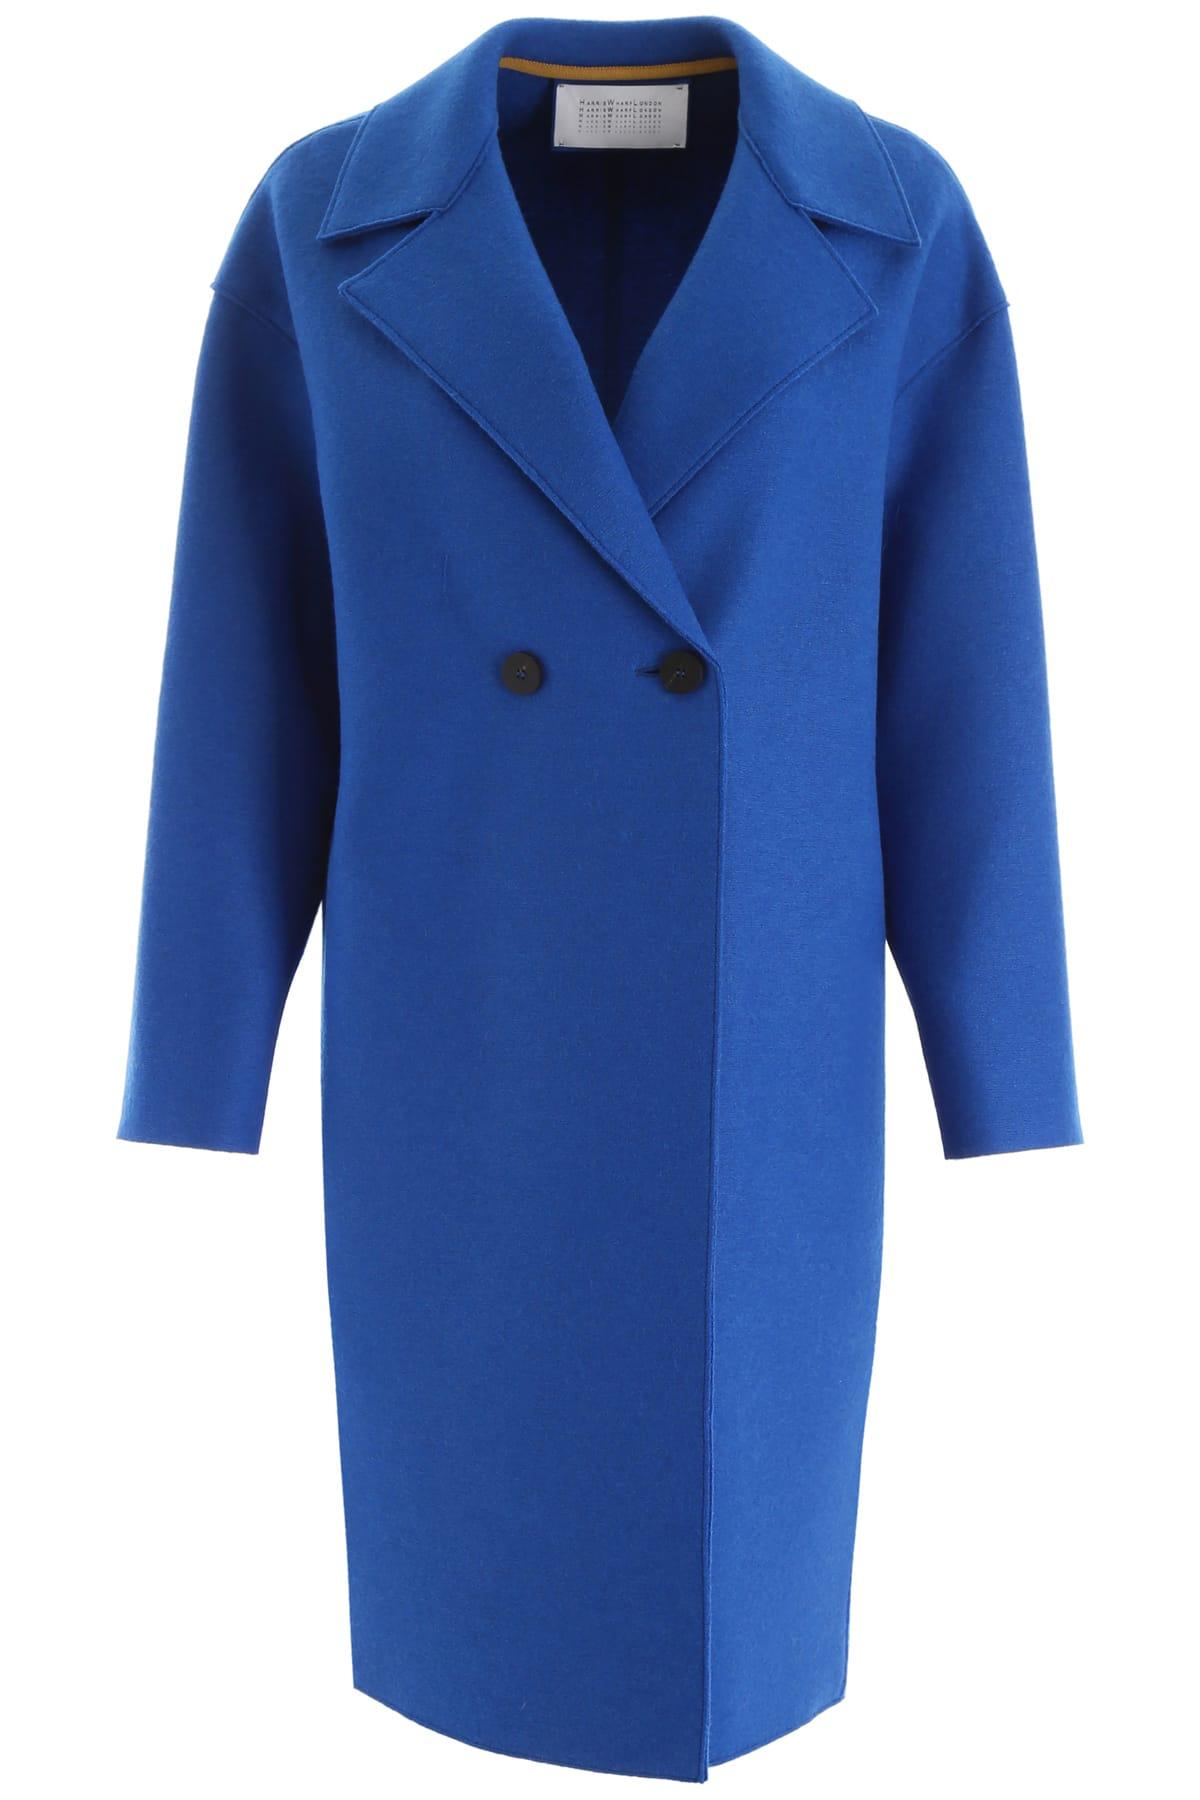 Harris Wharf London Double Coat